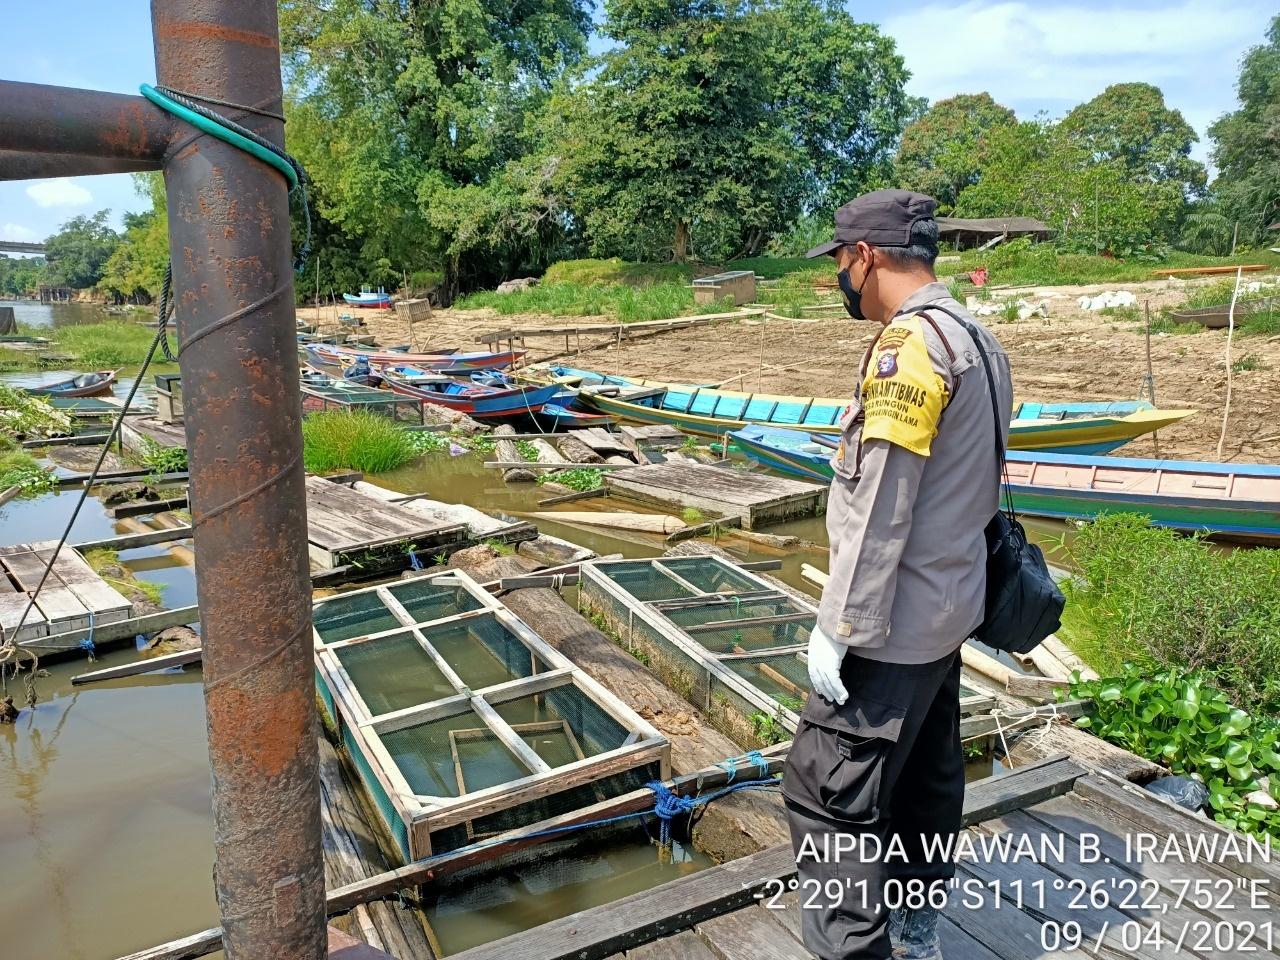 Bhabinkamtibmas Desa Rungun Sambangi Nelayan Perikanan Darat